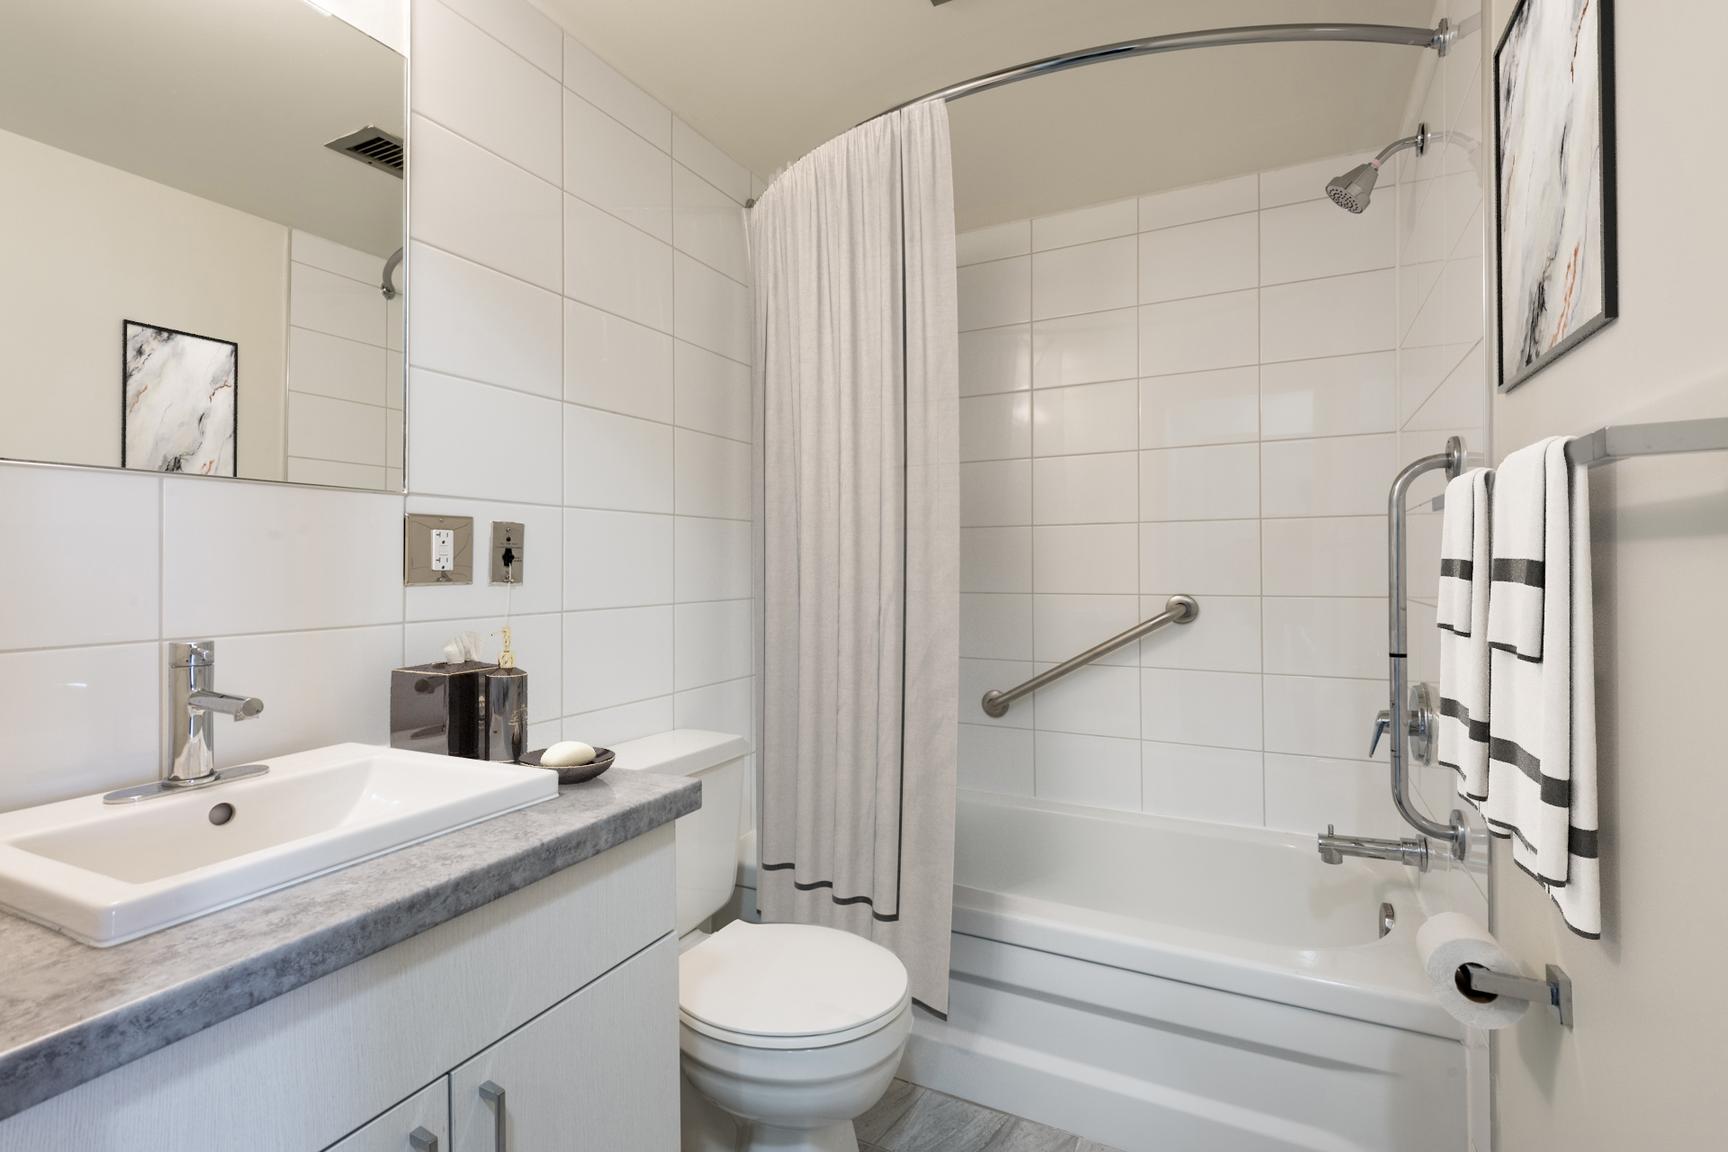 1 bedroom Apartments for rent in Laval at Le Quatre Cent - Photo 16 - RentersPages – L407184